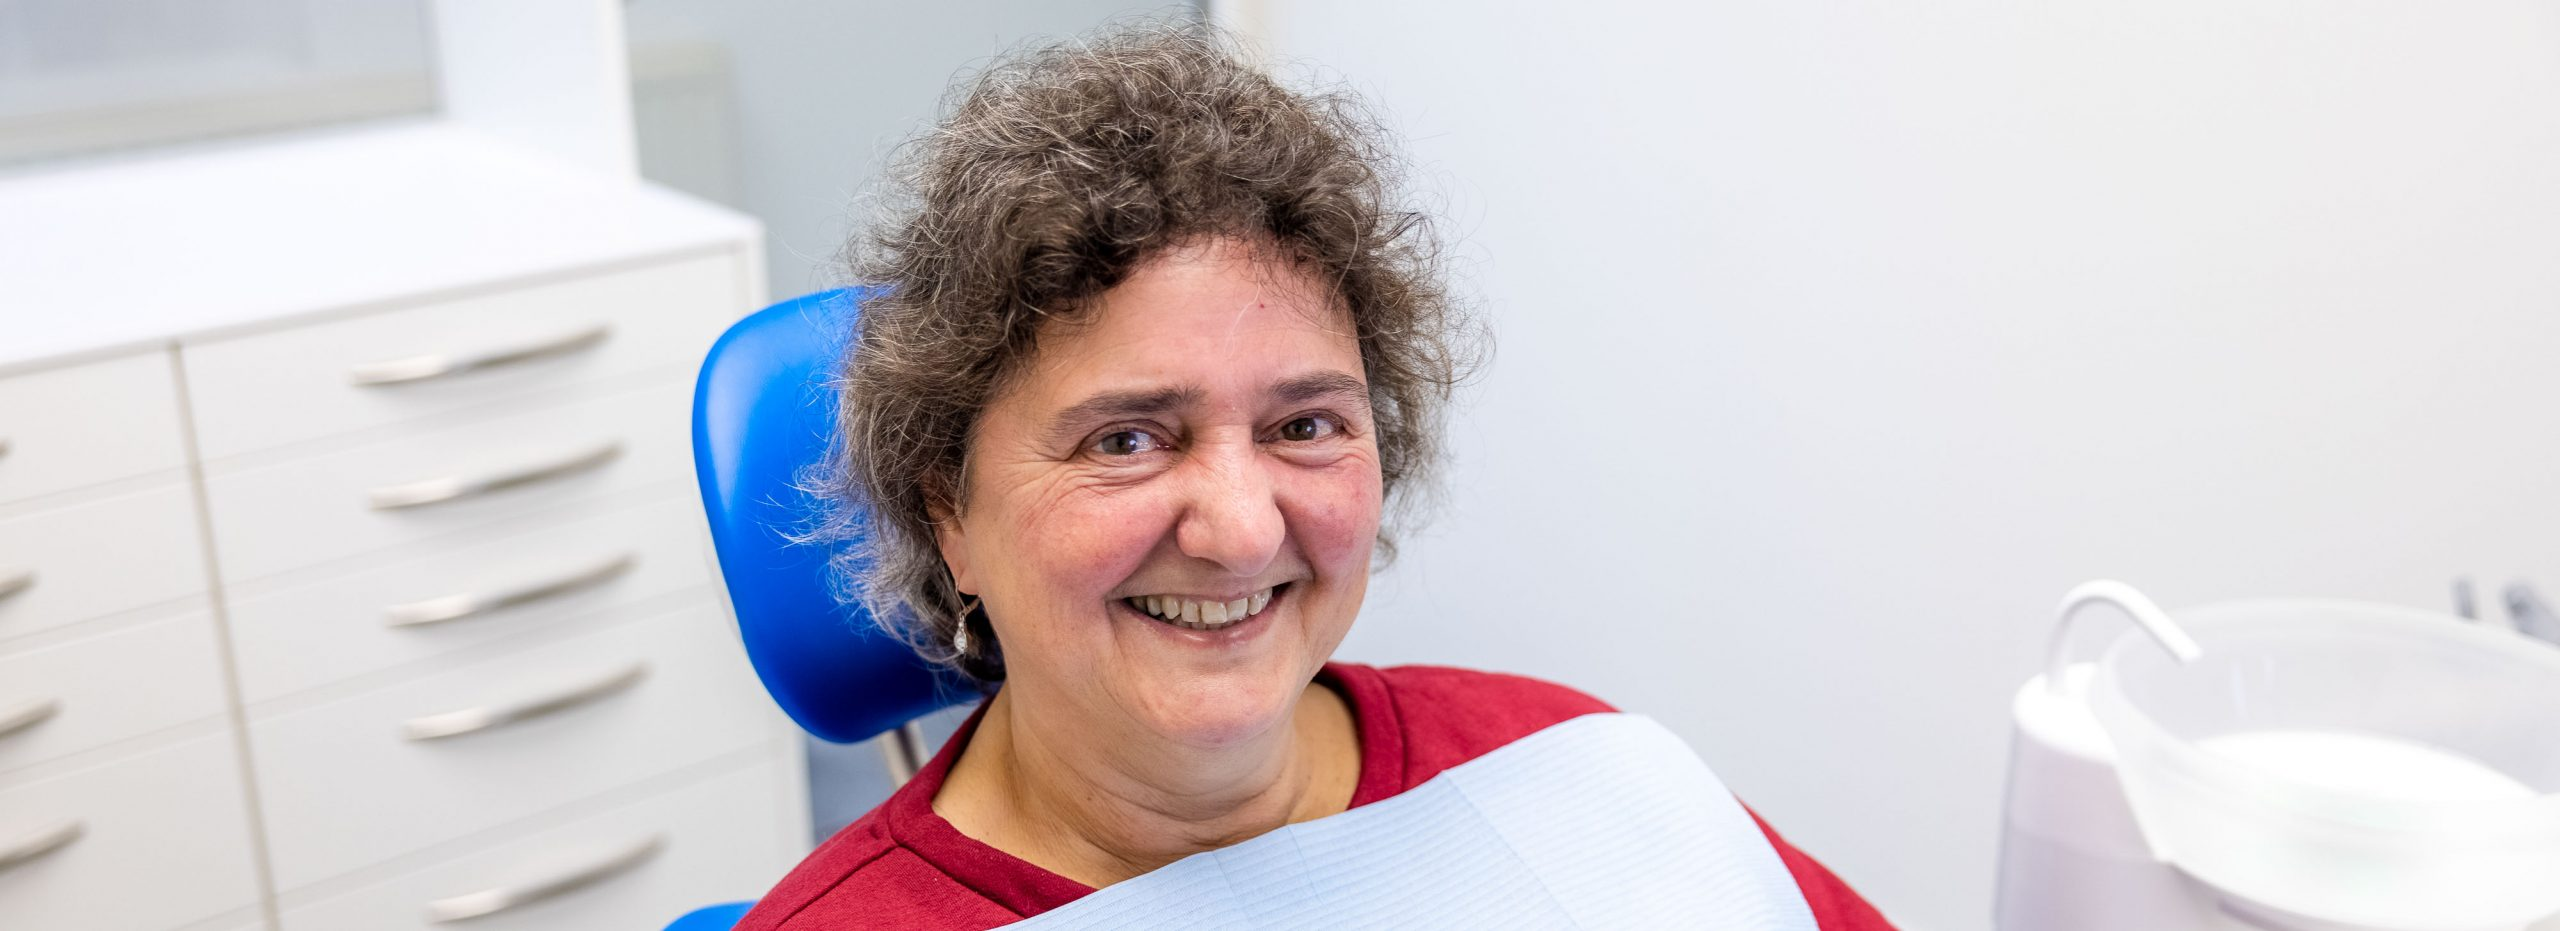 Tandartspraktijk hoflaan tandartsen 12 scaled